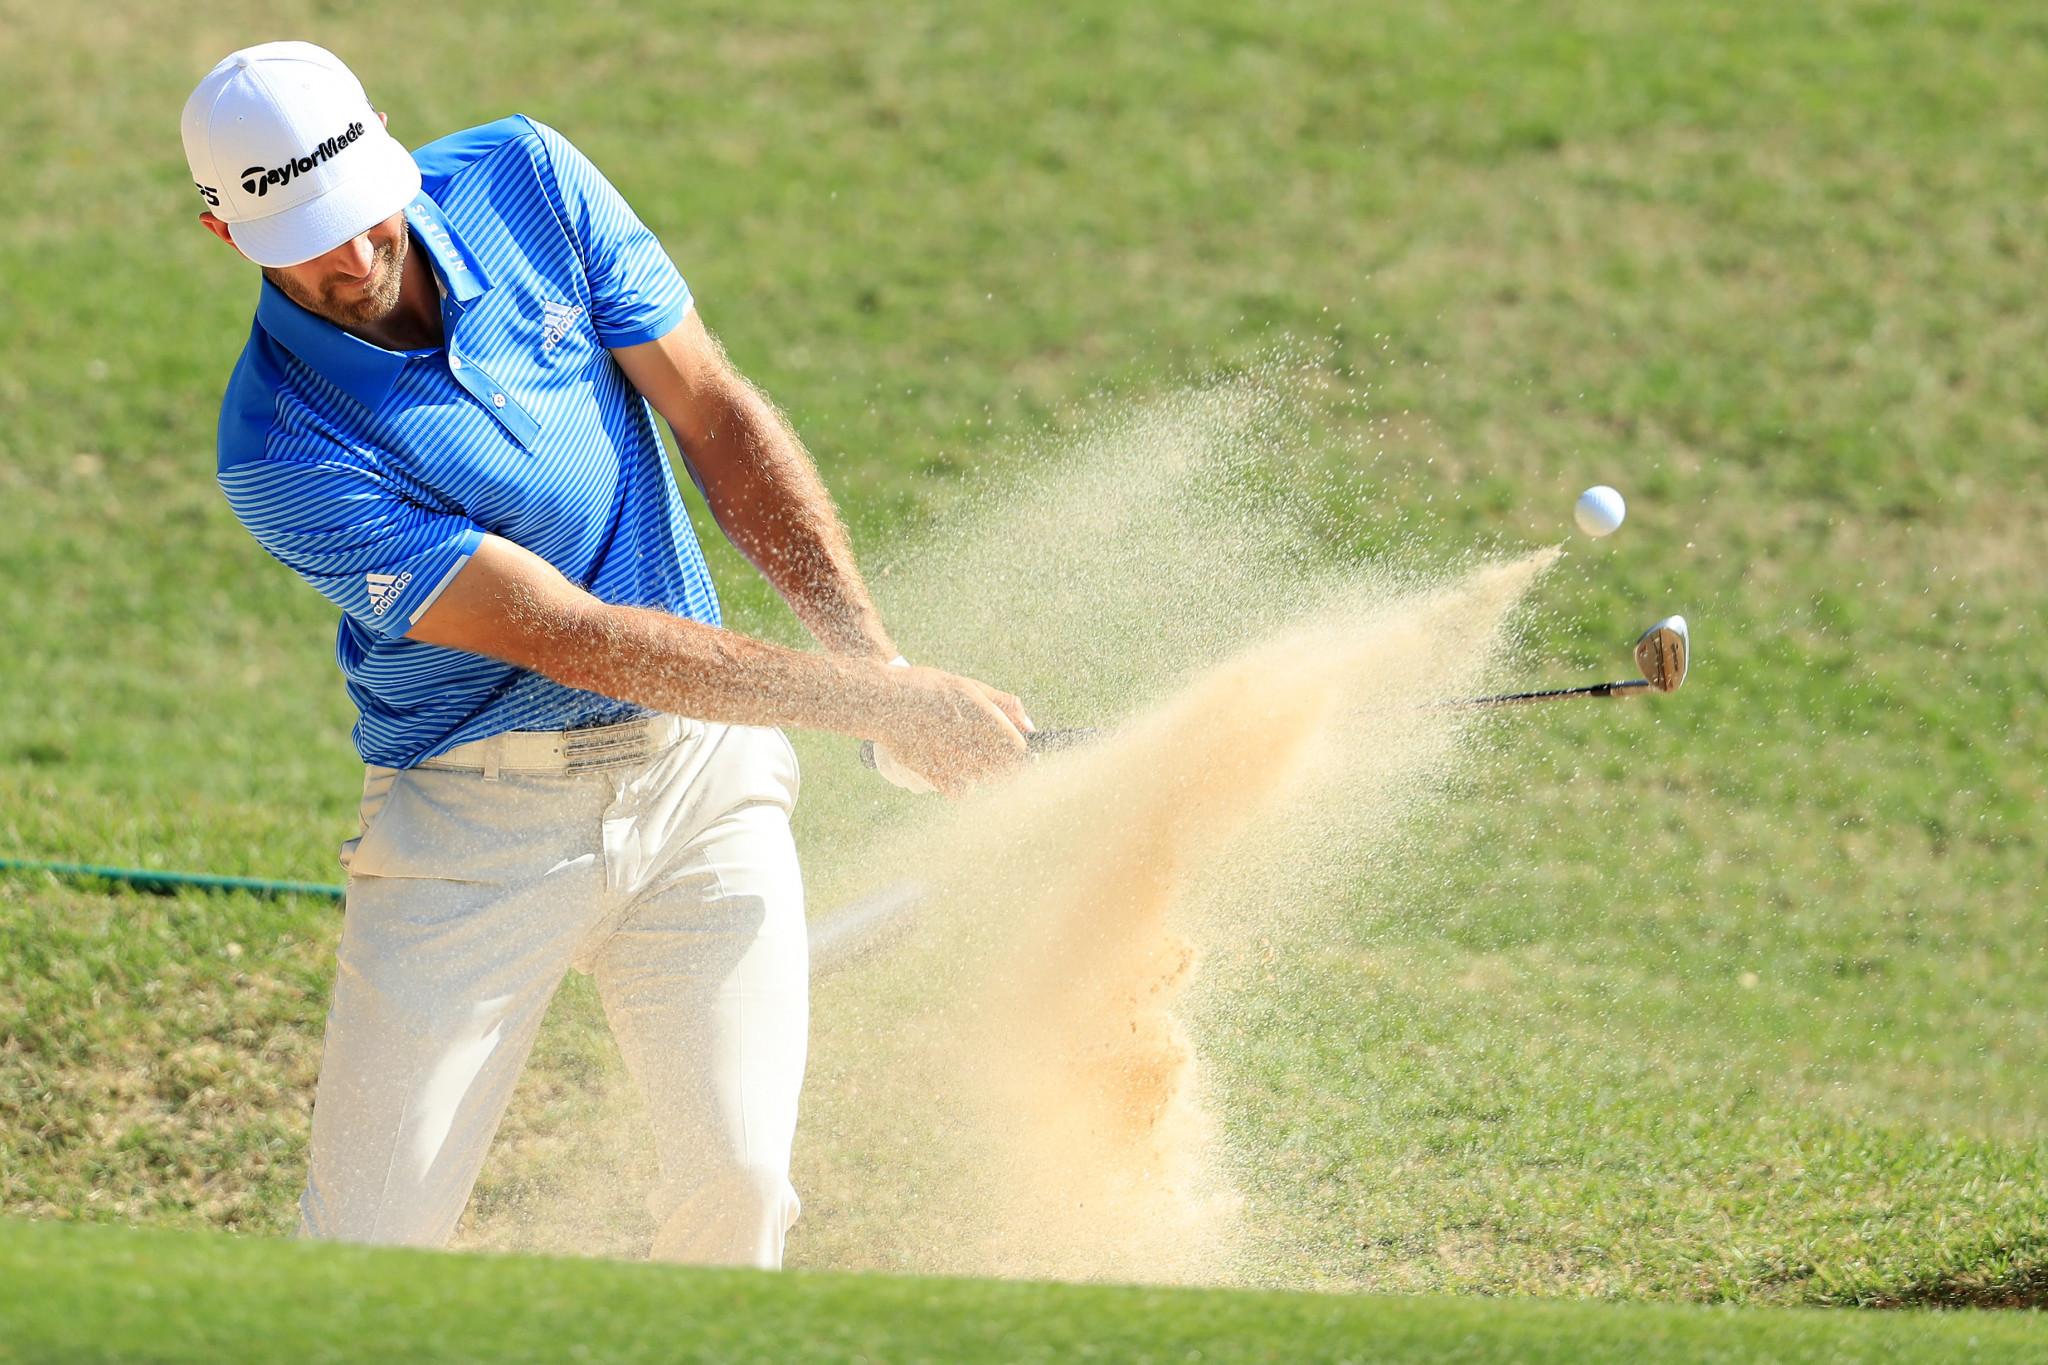 Johnson seeking repeat win at World Golf Championships leg in Austin